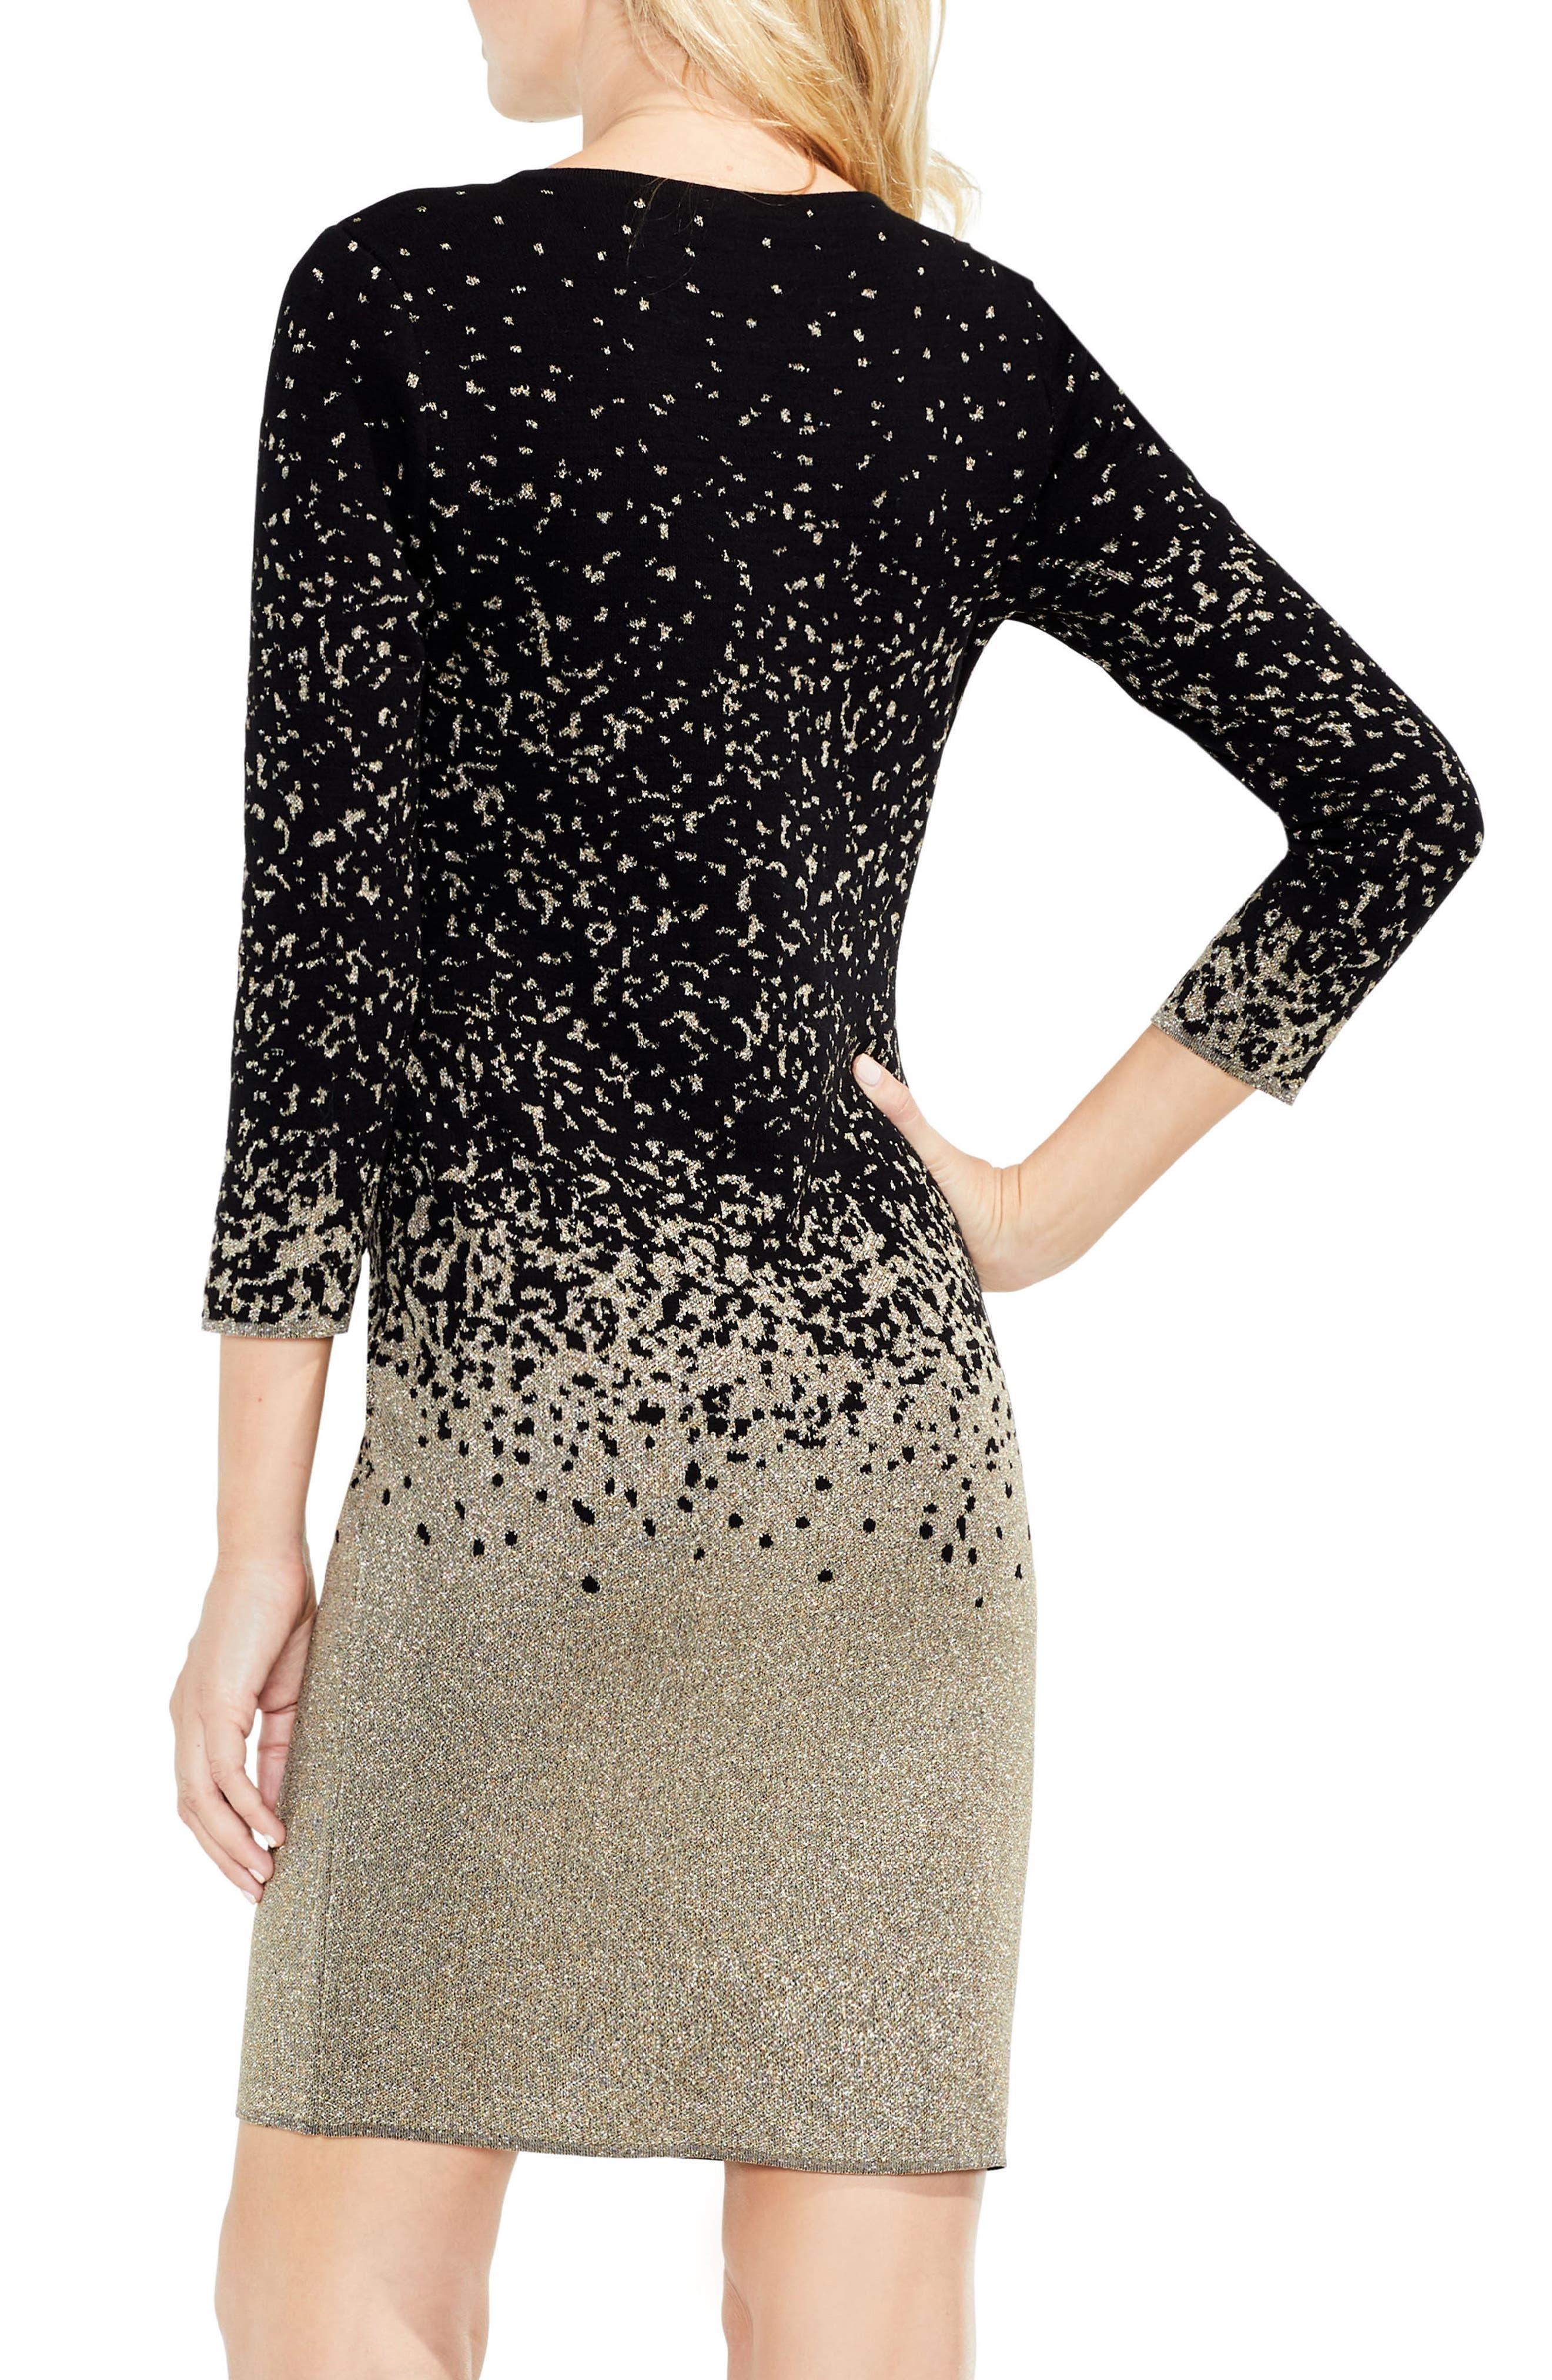 Alternate Image 3  - Vince Camuto Metallic Ombrè Sweater Dress